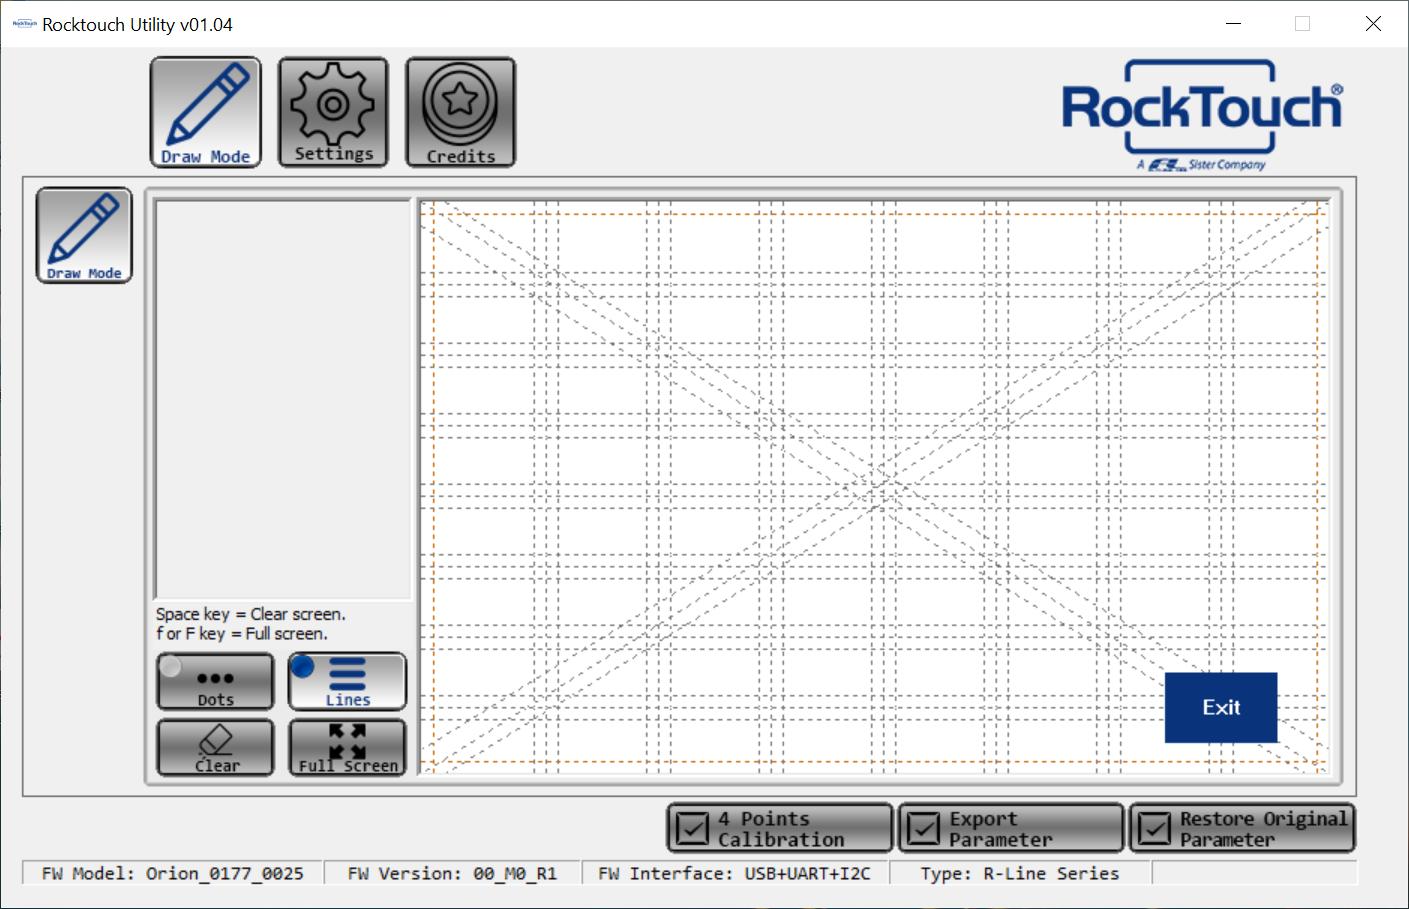 "WYSIWYG - Rocktouch utility ver 01.04 ""Draw Mode.png"